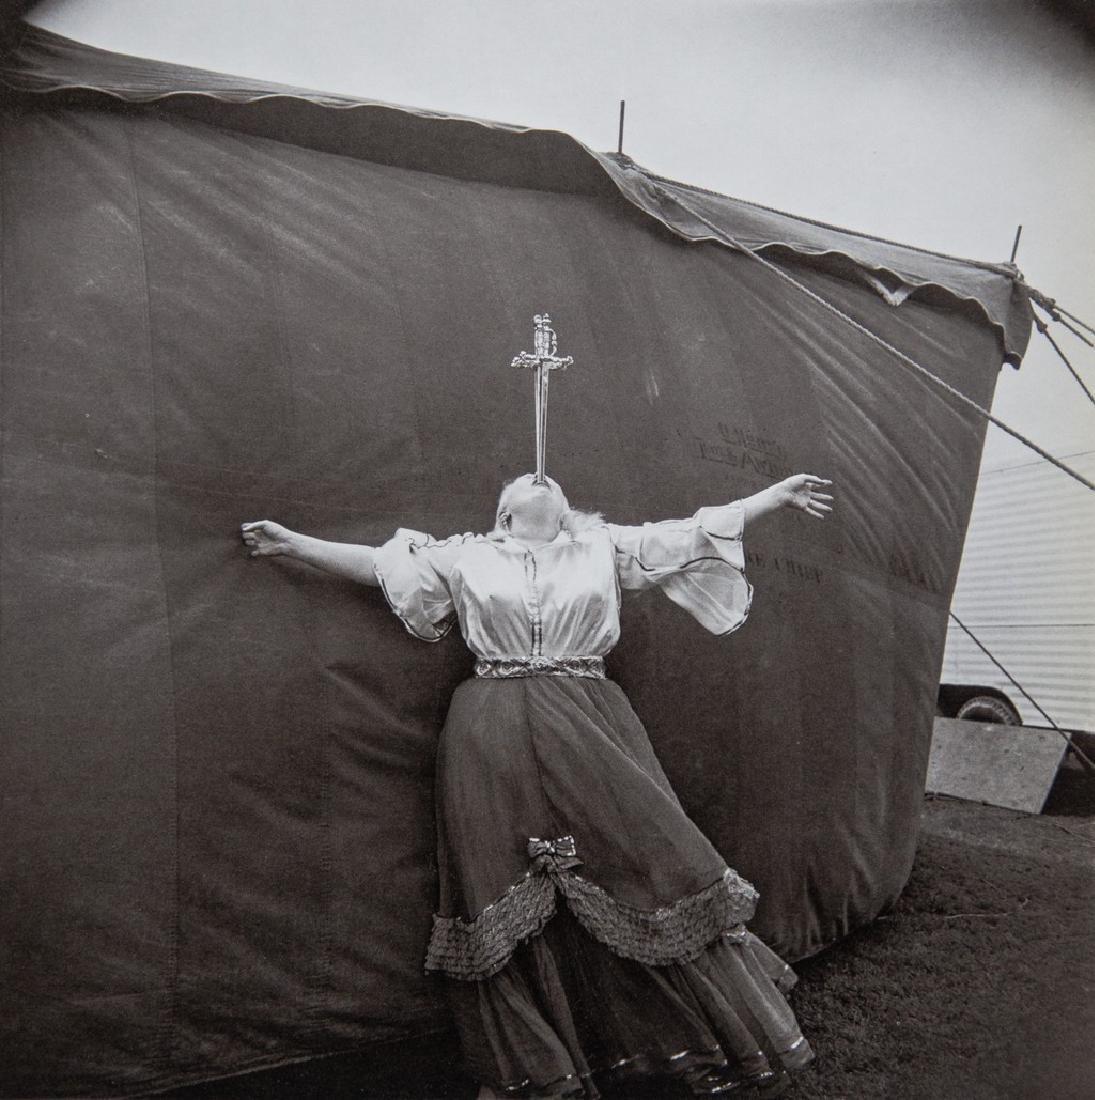 DIANE ARBUS - Albino Sword Swallower, 1970